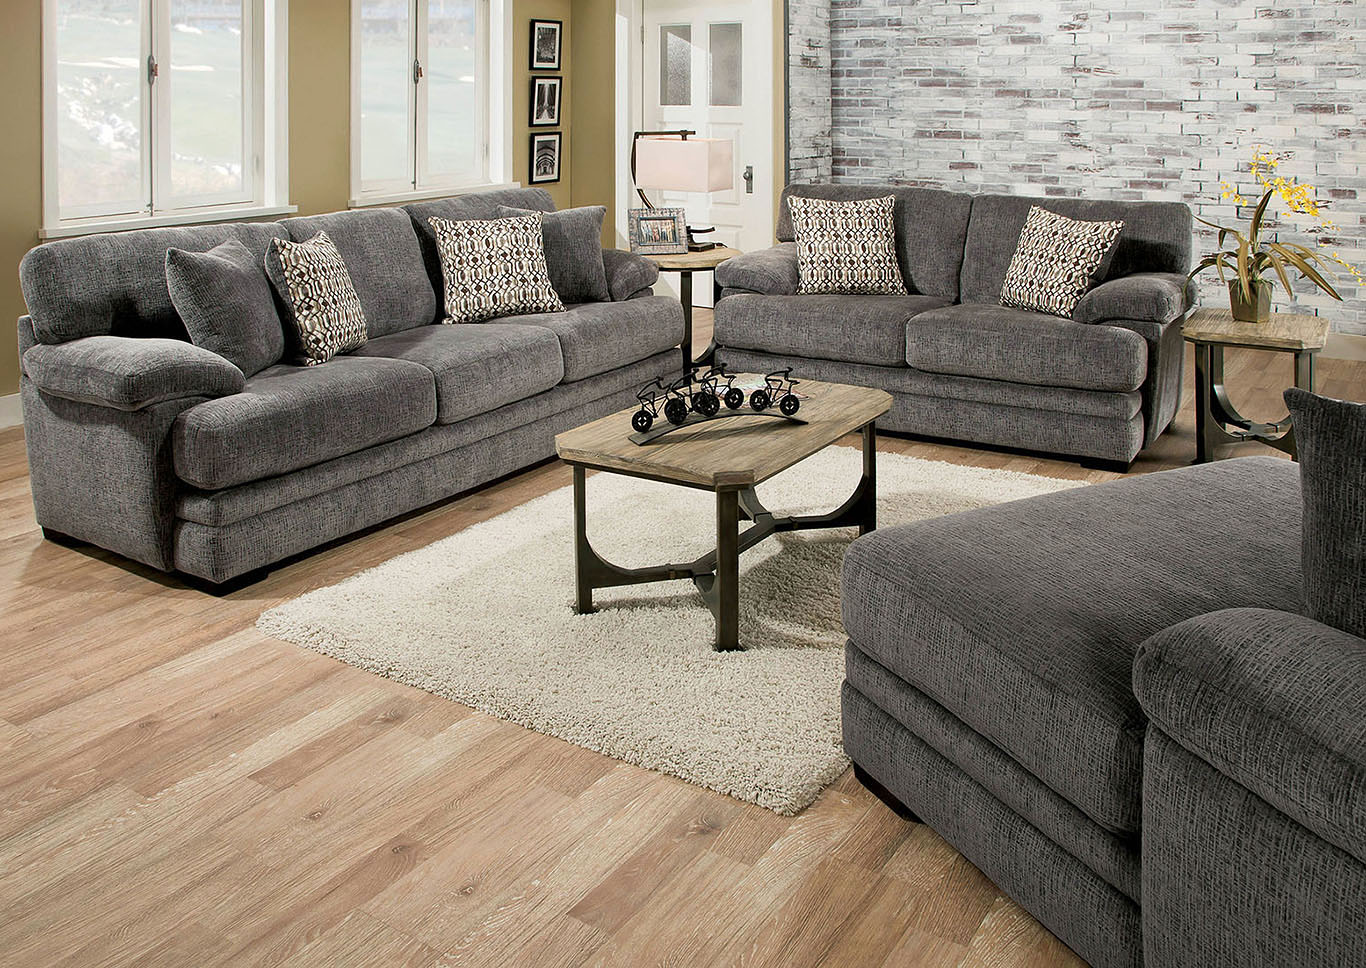 Abrianna Gray Sofa,Furniture Of America